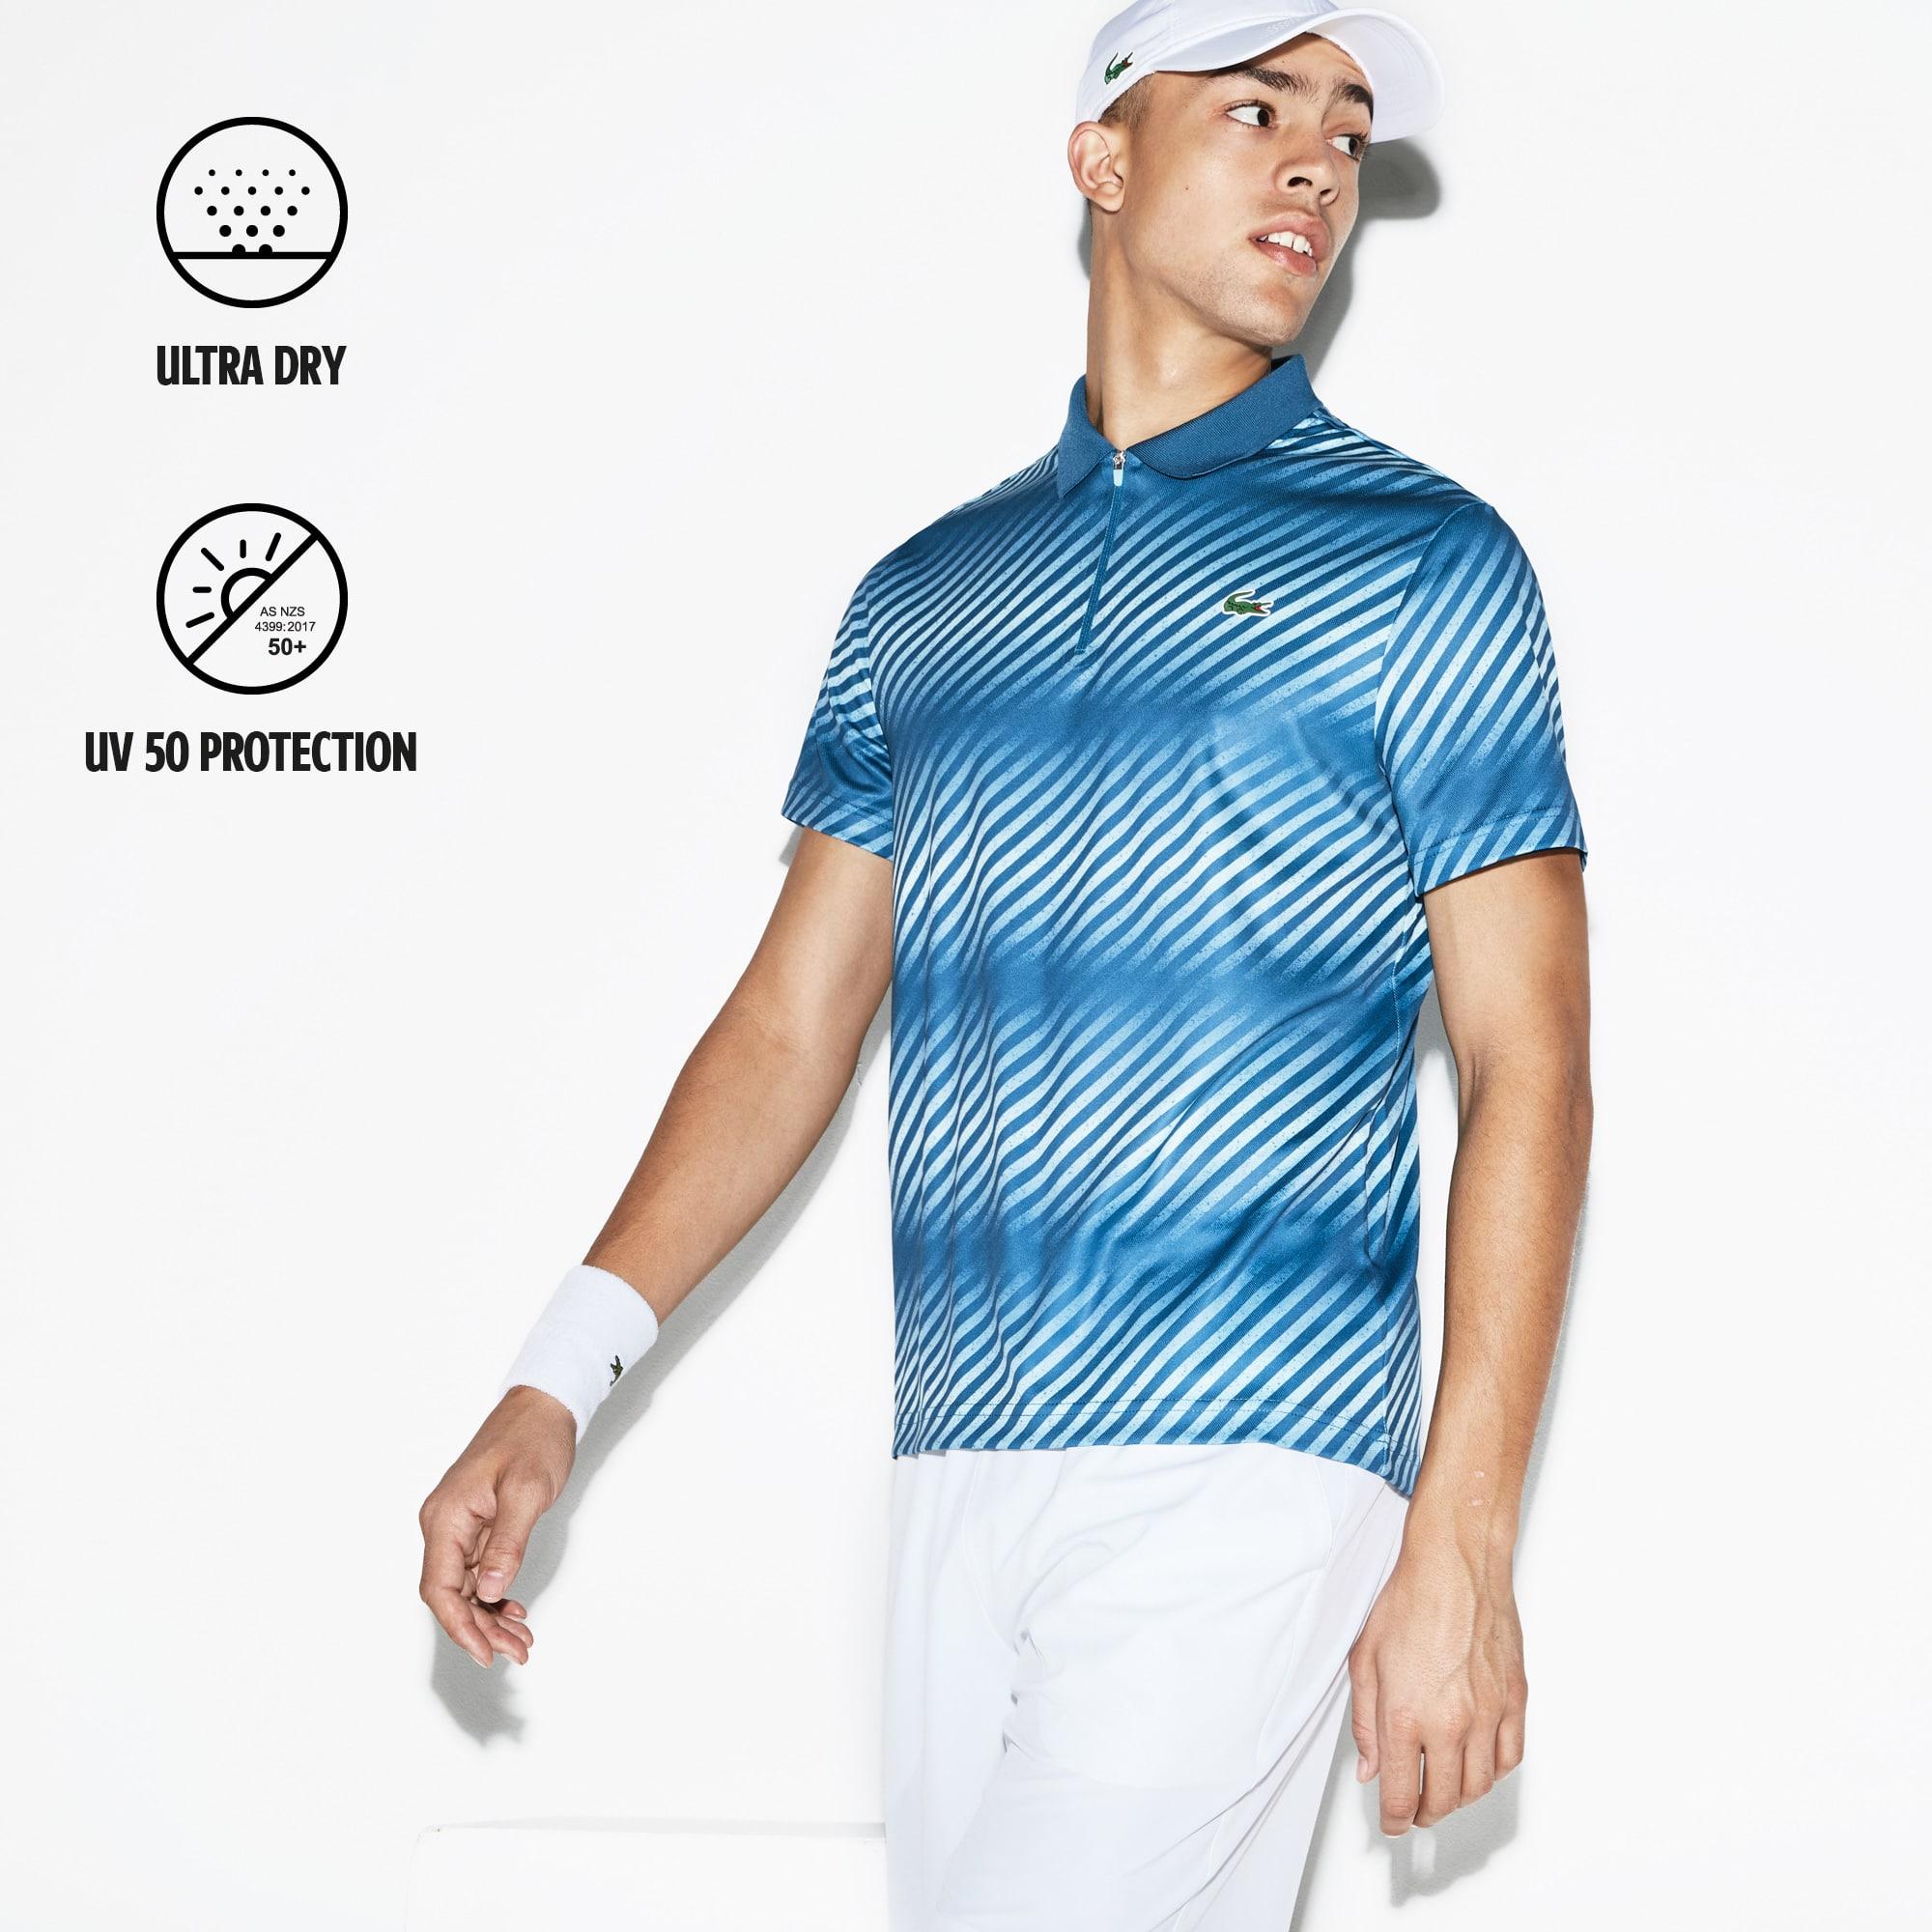 0752b1c9 Mens Sport Ultra Dry Zip Tennis Polo Shirt - Nils Stucki Kieferorthopäde